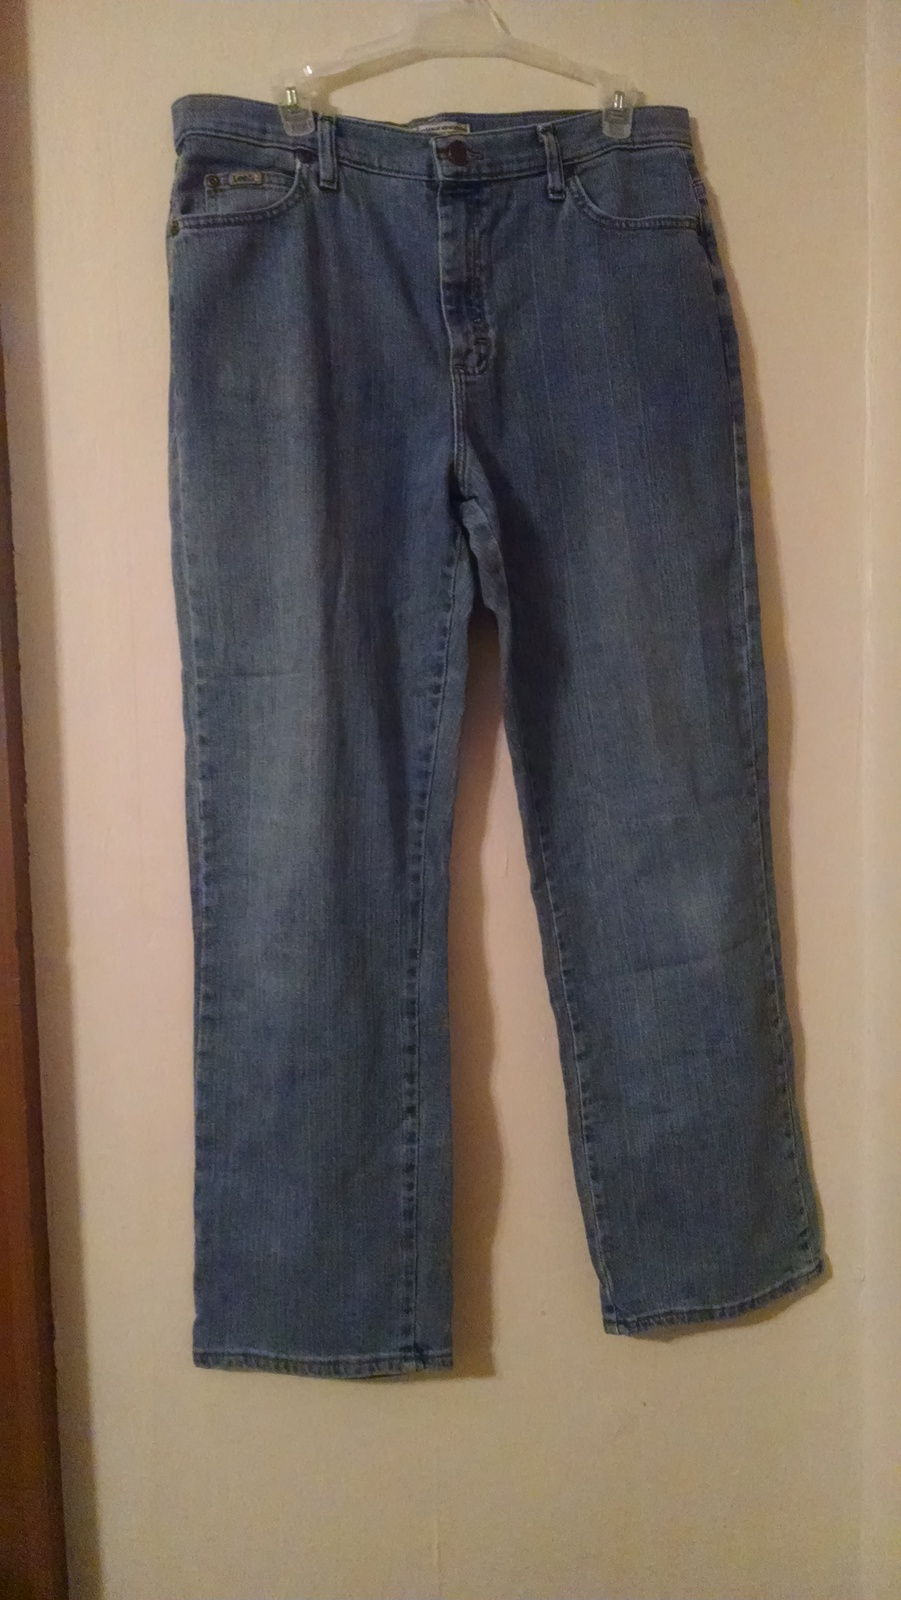 Women's sz 12 jeans ras544